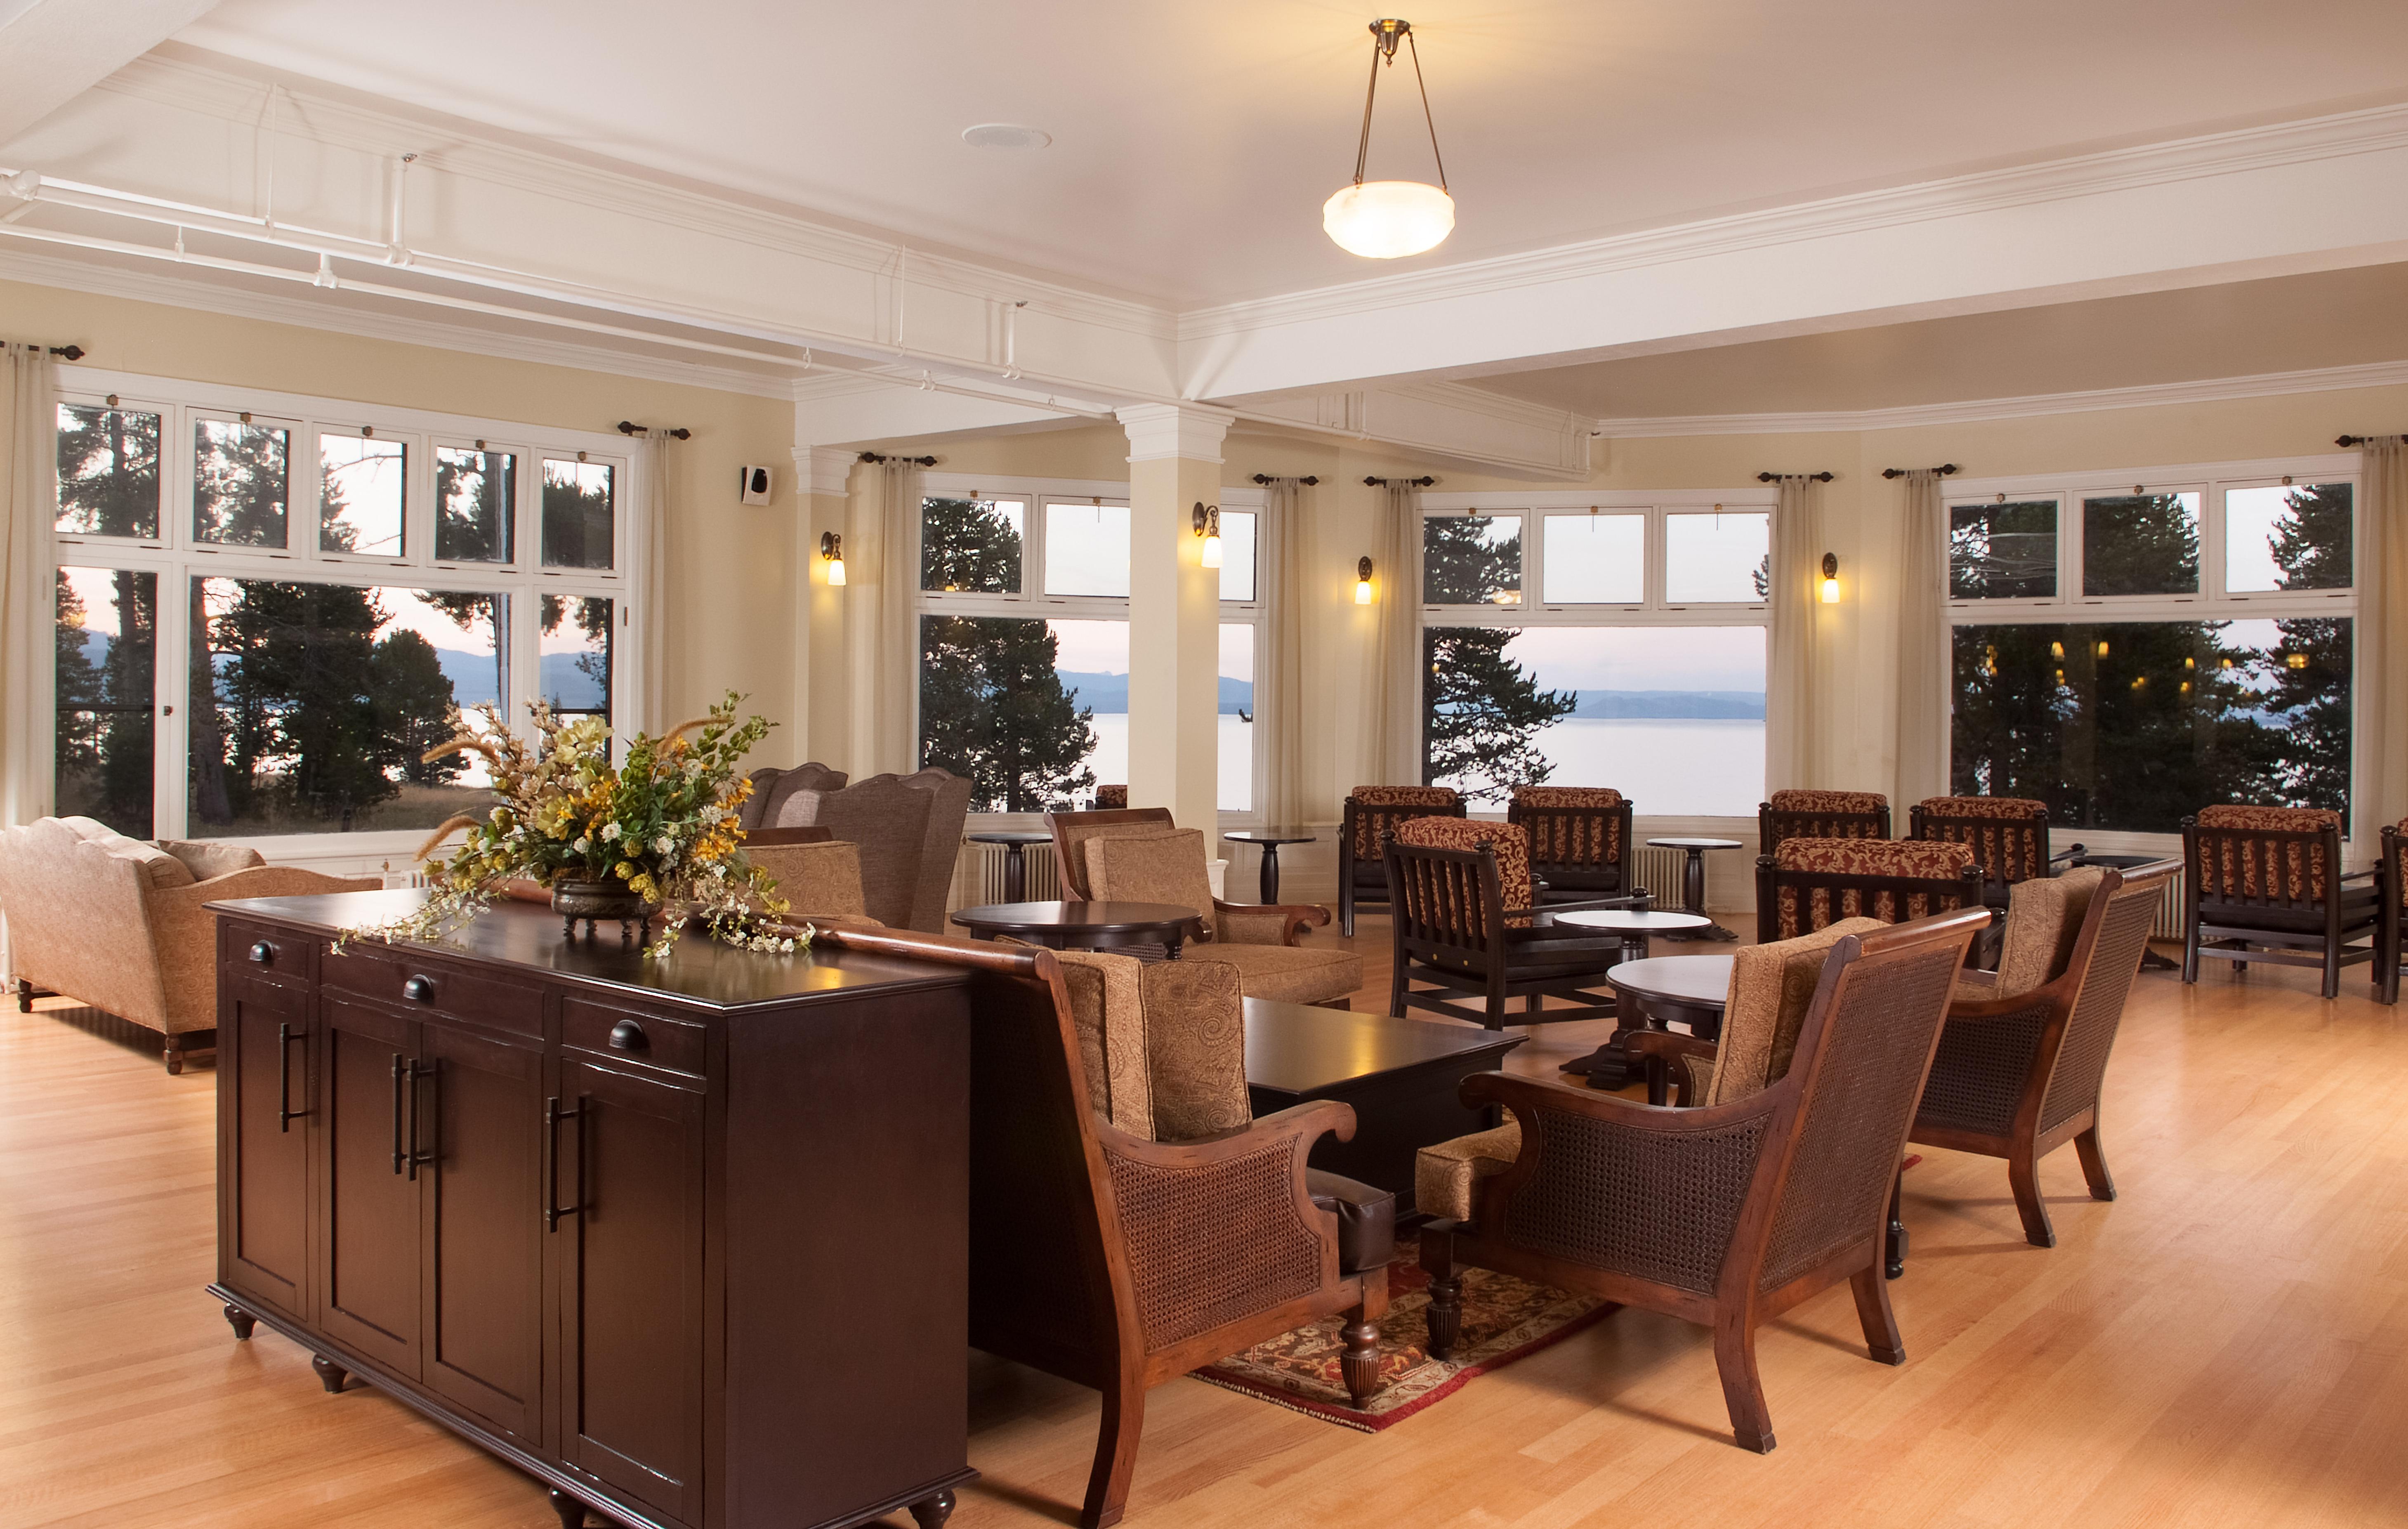 Old Faithful Inn Dining Room File Lake Yellowstone Hotel Sunroom 3 17158561455 Jpg